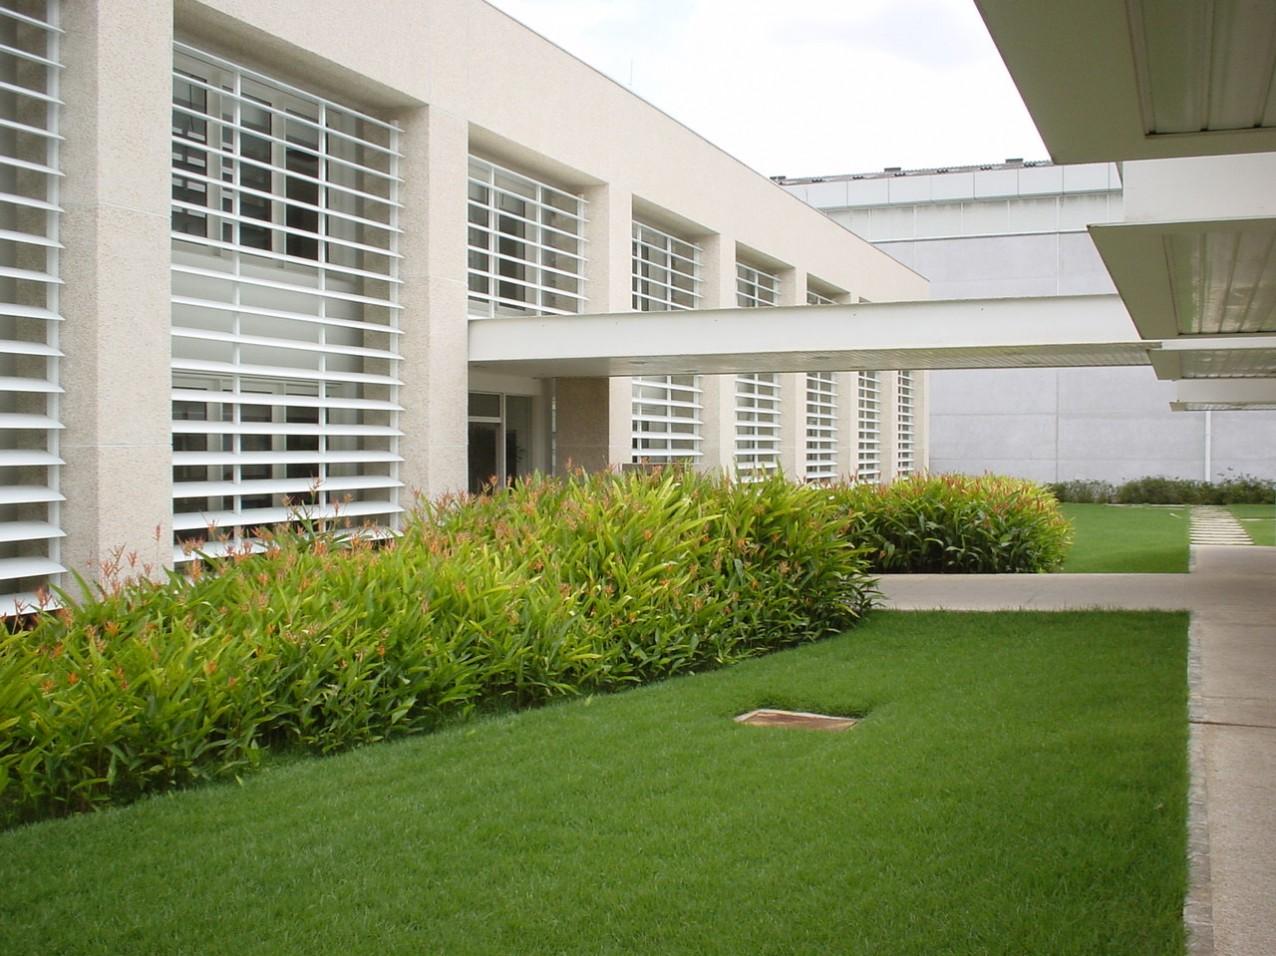 Obra industrial Durr do Brasil - Jardim